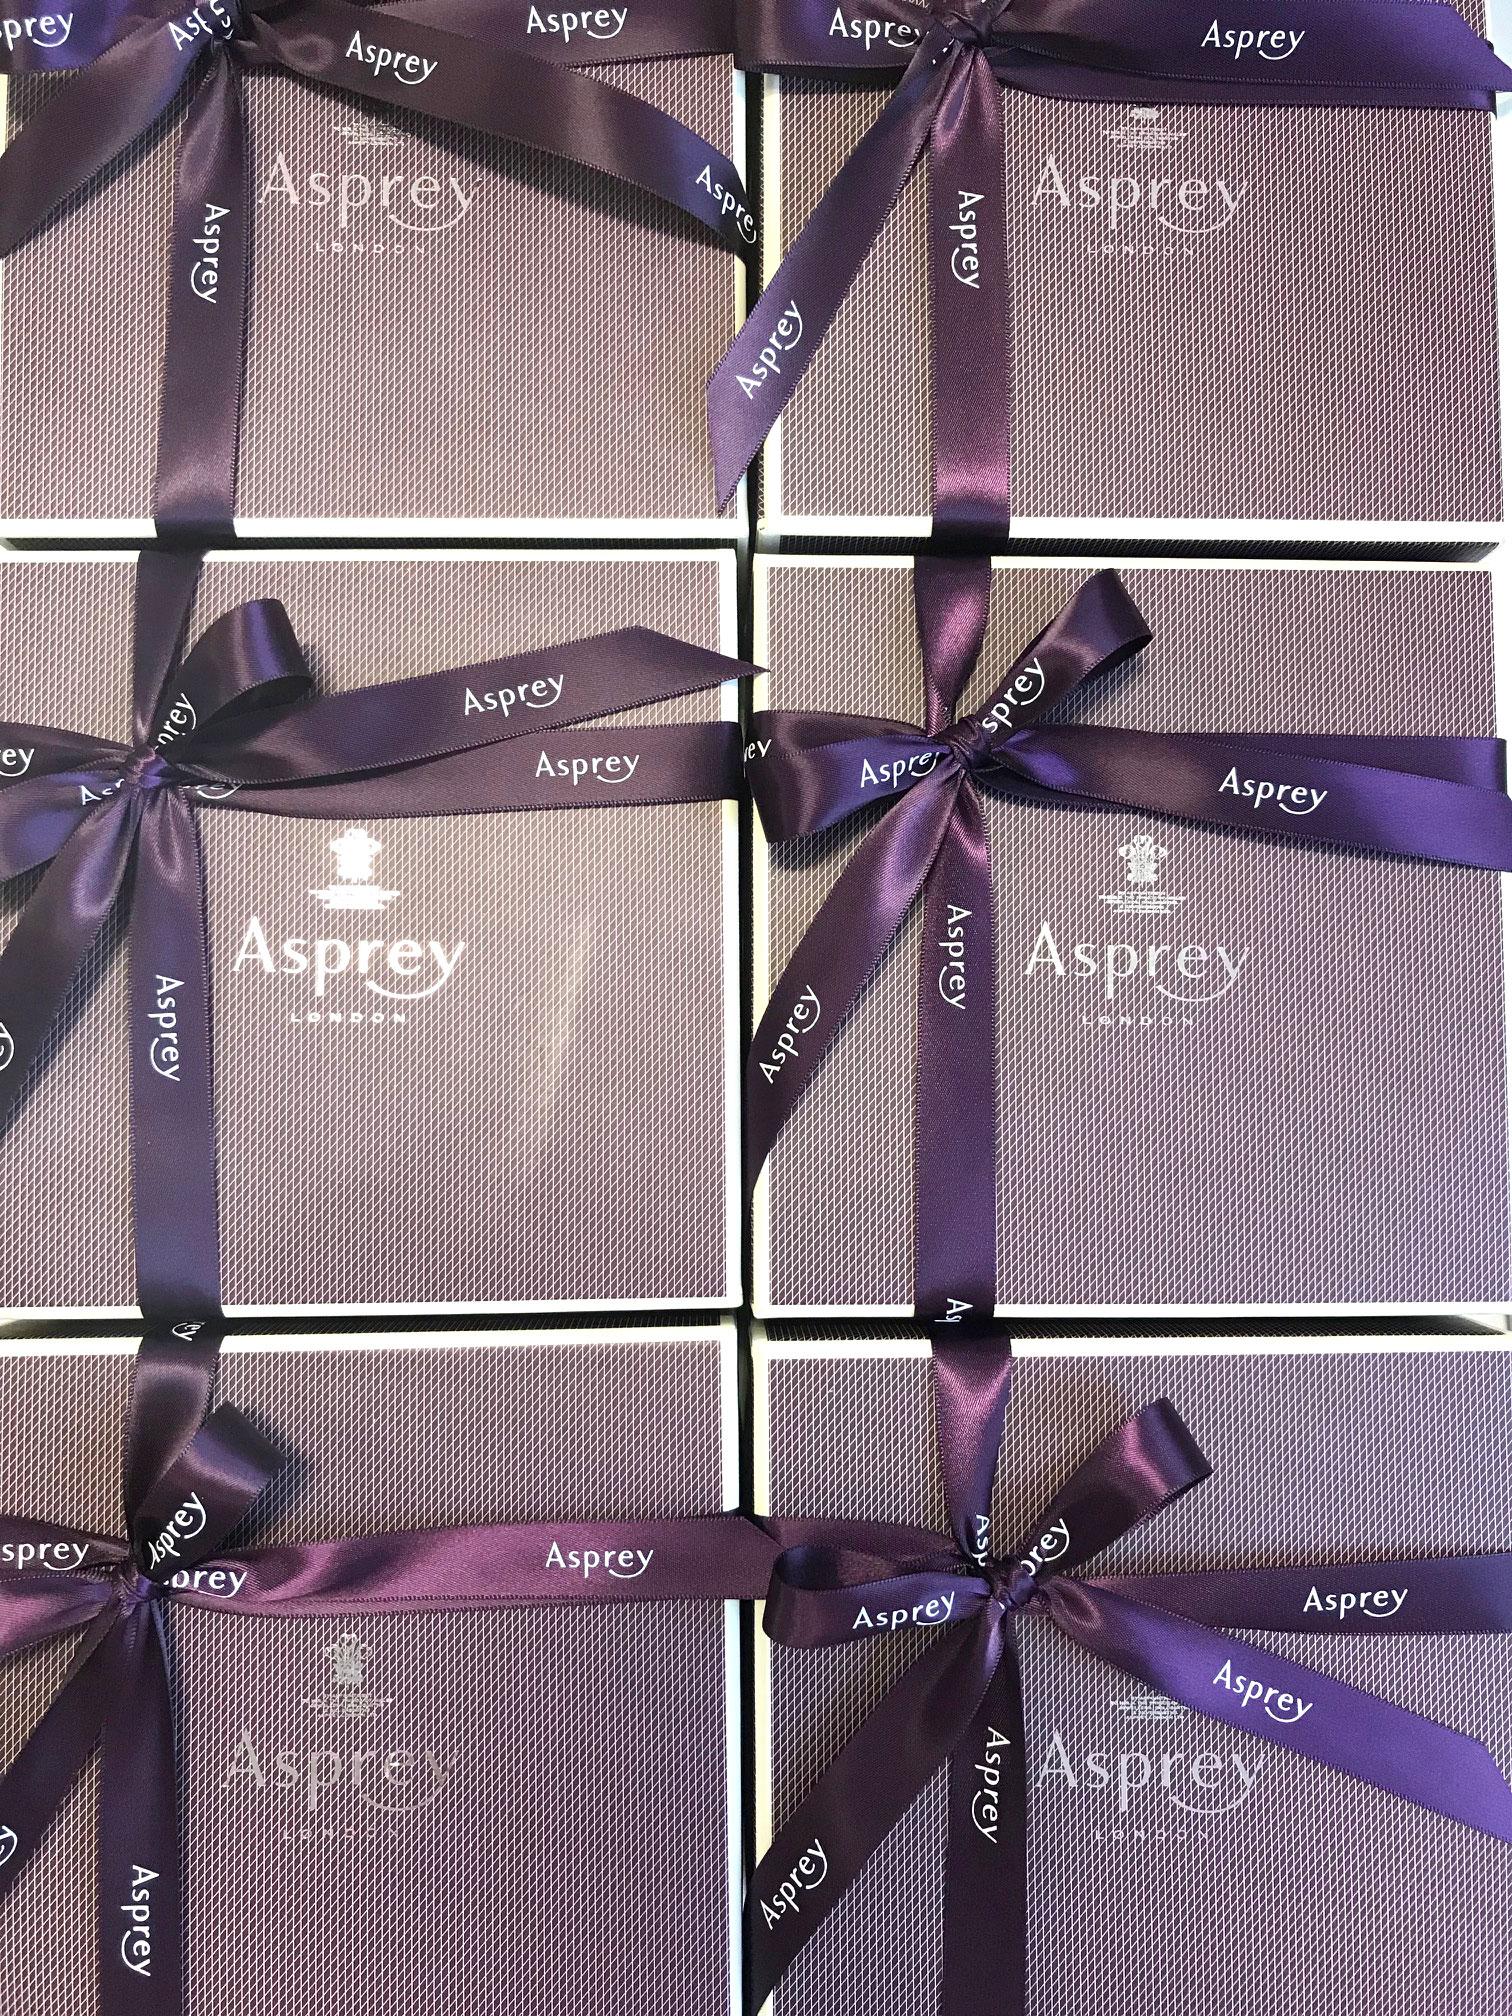 Asprey-Baubles.jpg